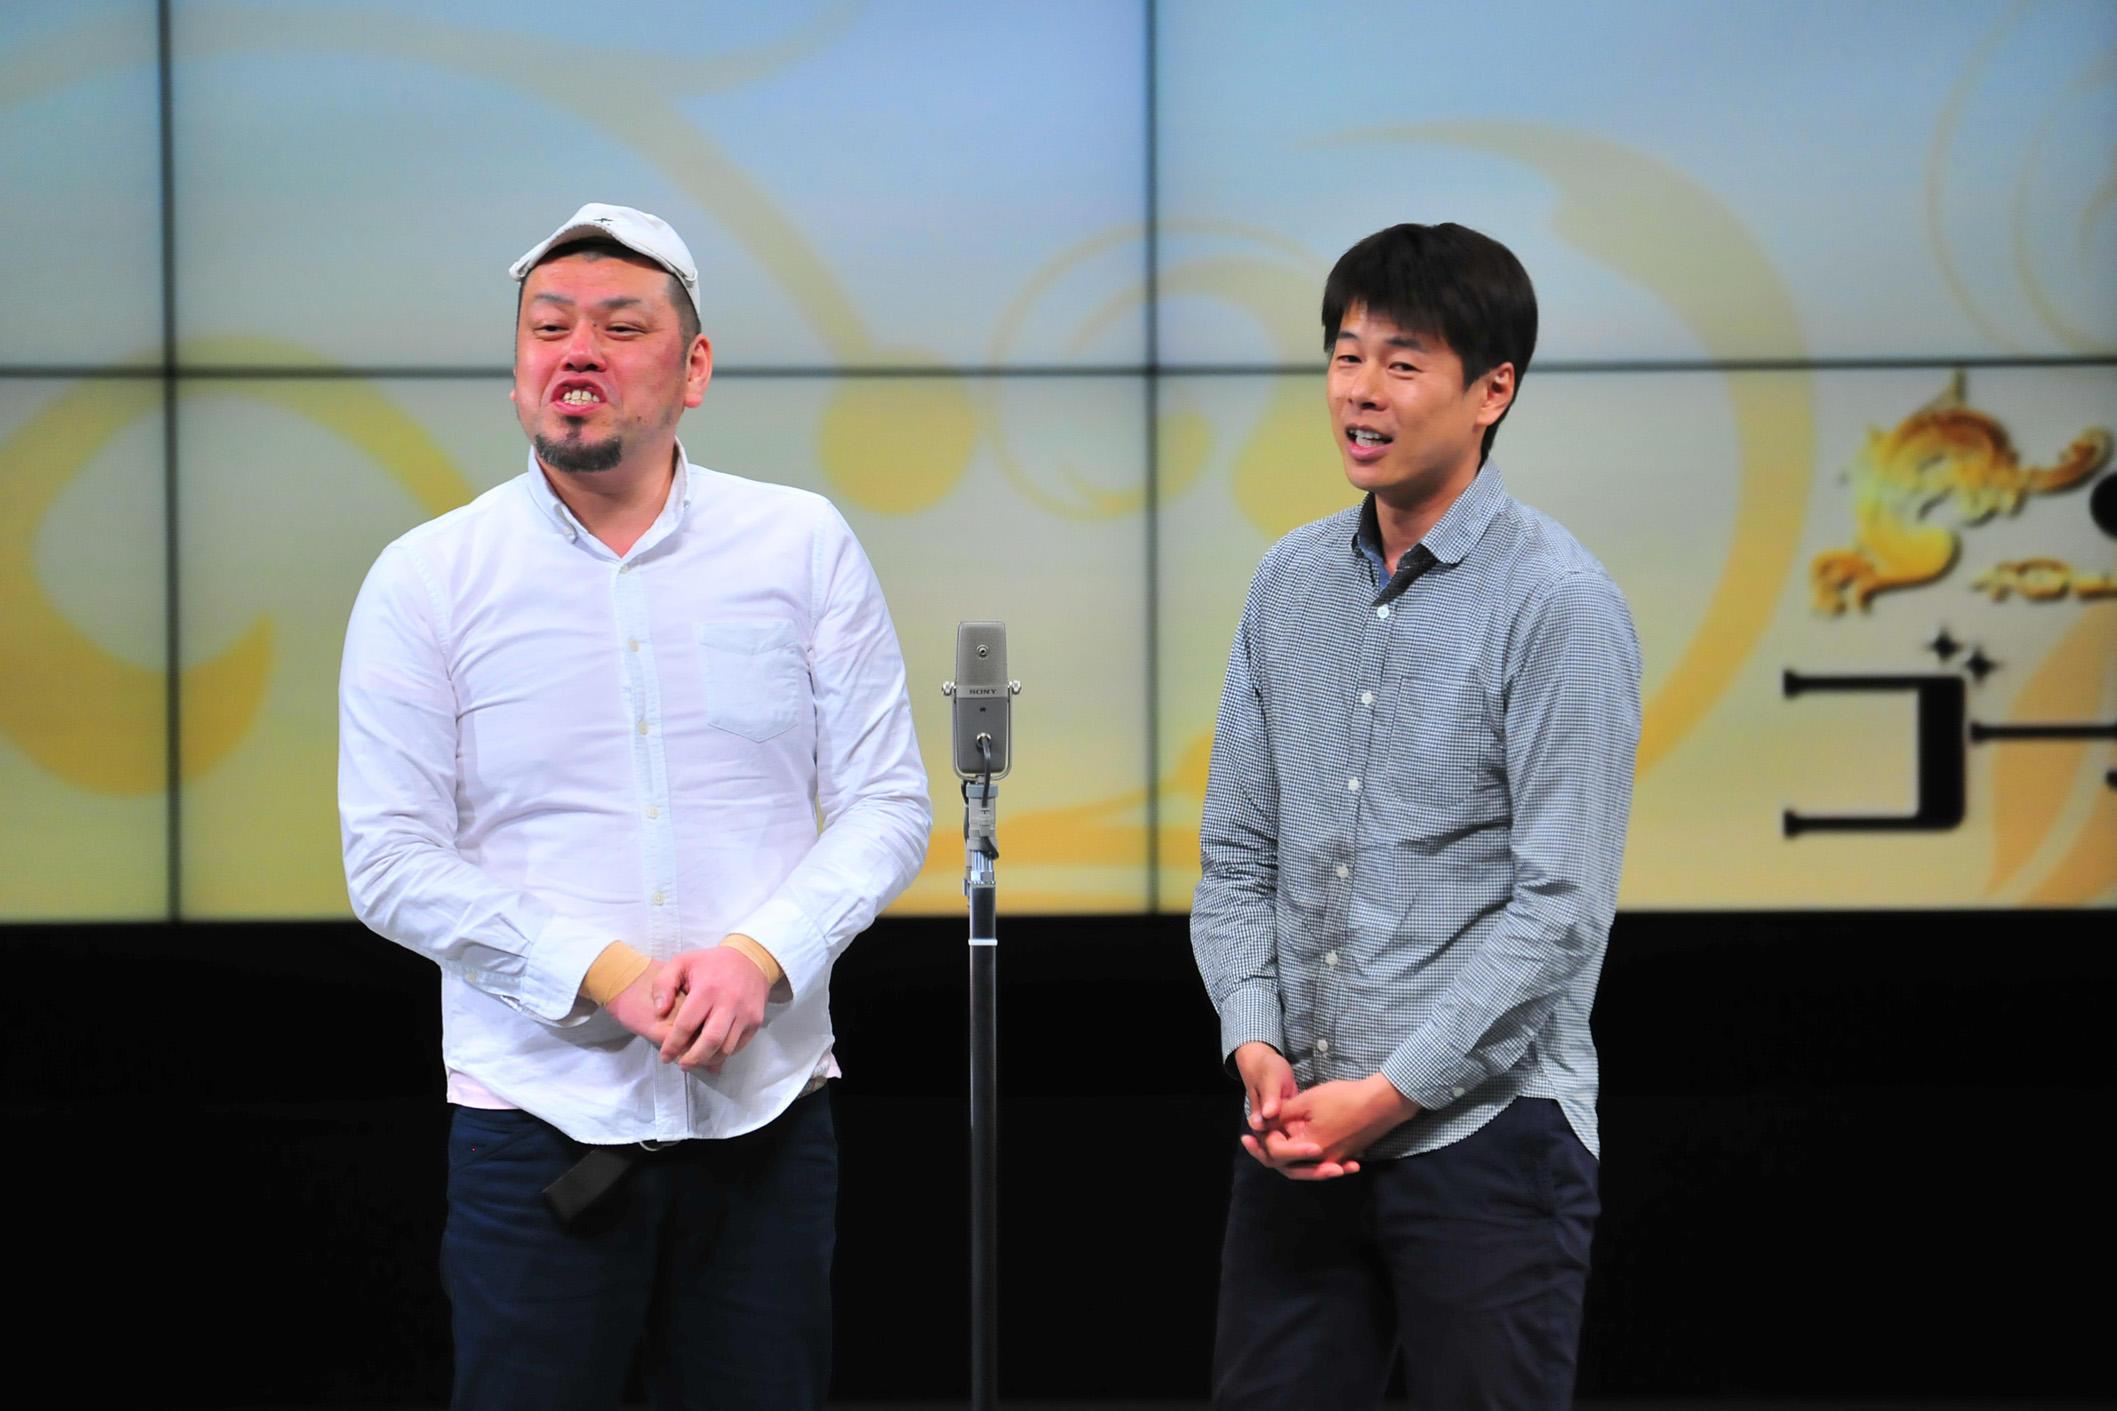 http://news.yoshimoto.co.jp/20160421122903-f52d904c1a5ed821f65b0bb71cc1b8fca130a9e4.jpg